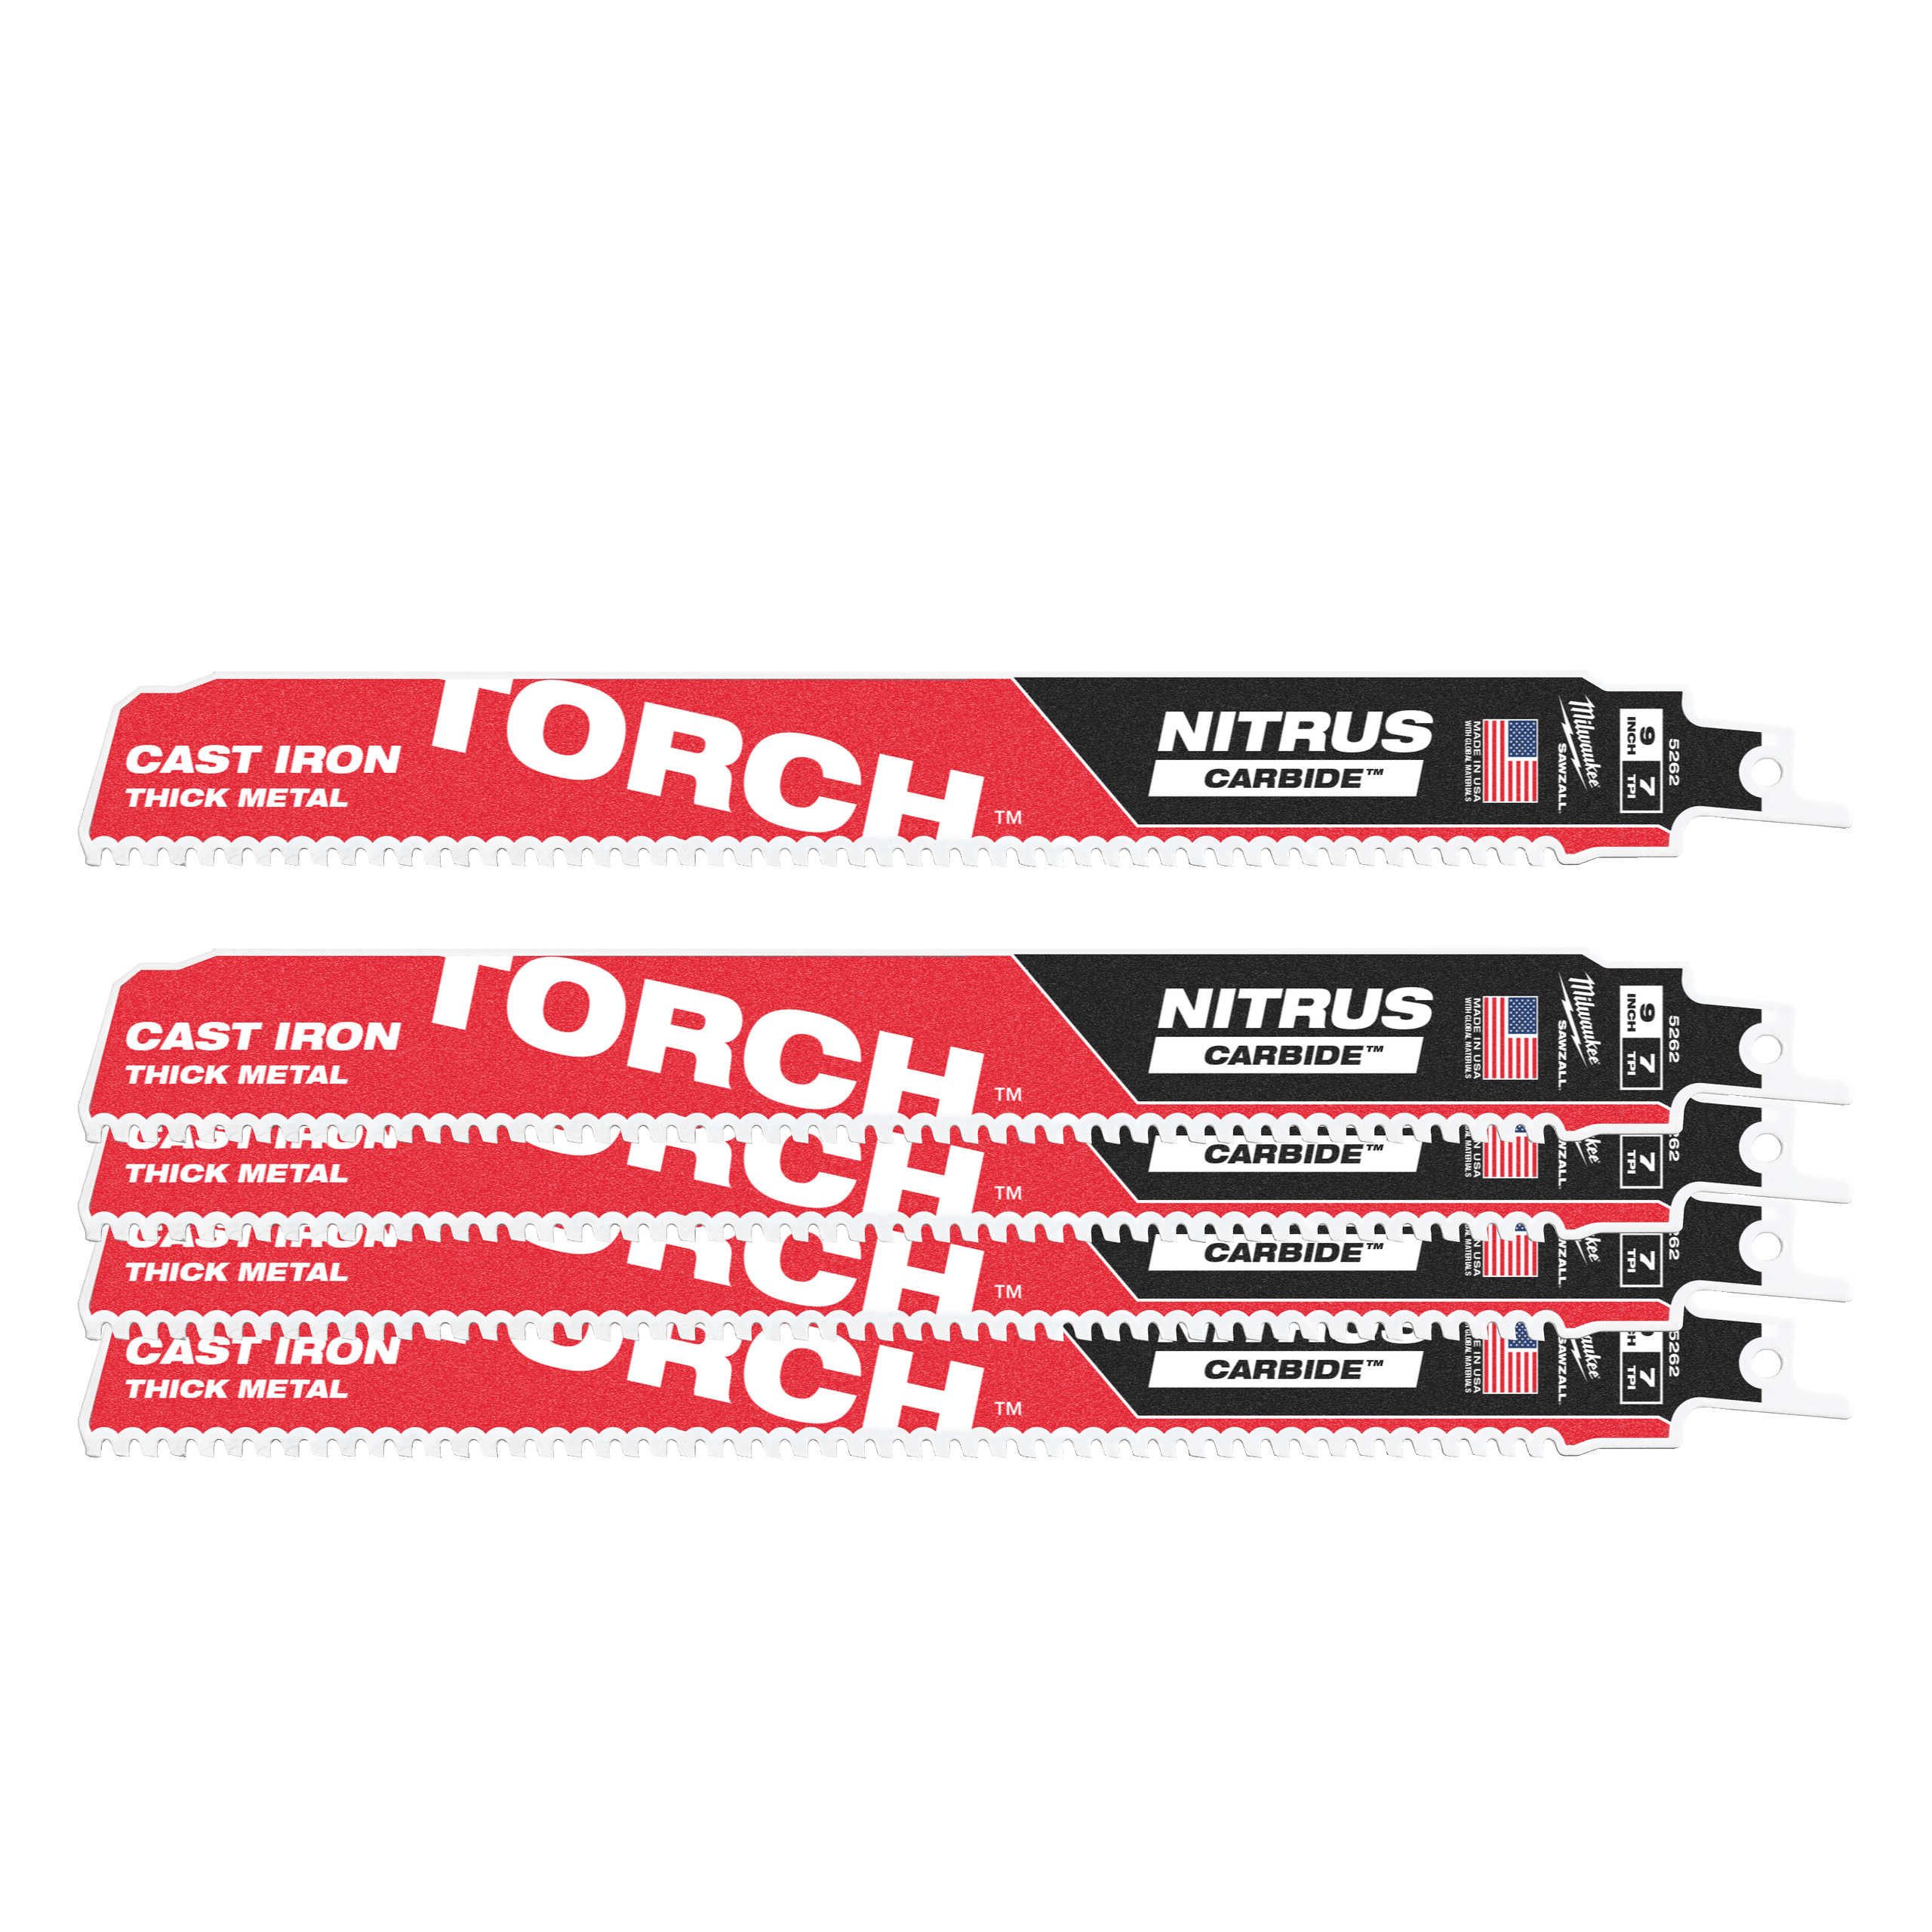 Pilové plátky TORCH Nitrus 230/7Tpi (5 ks)